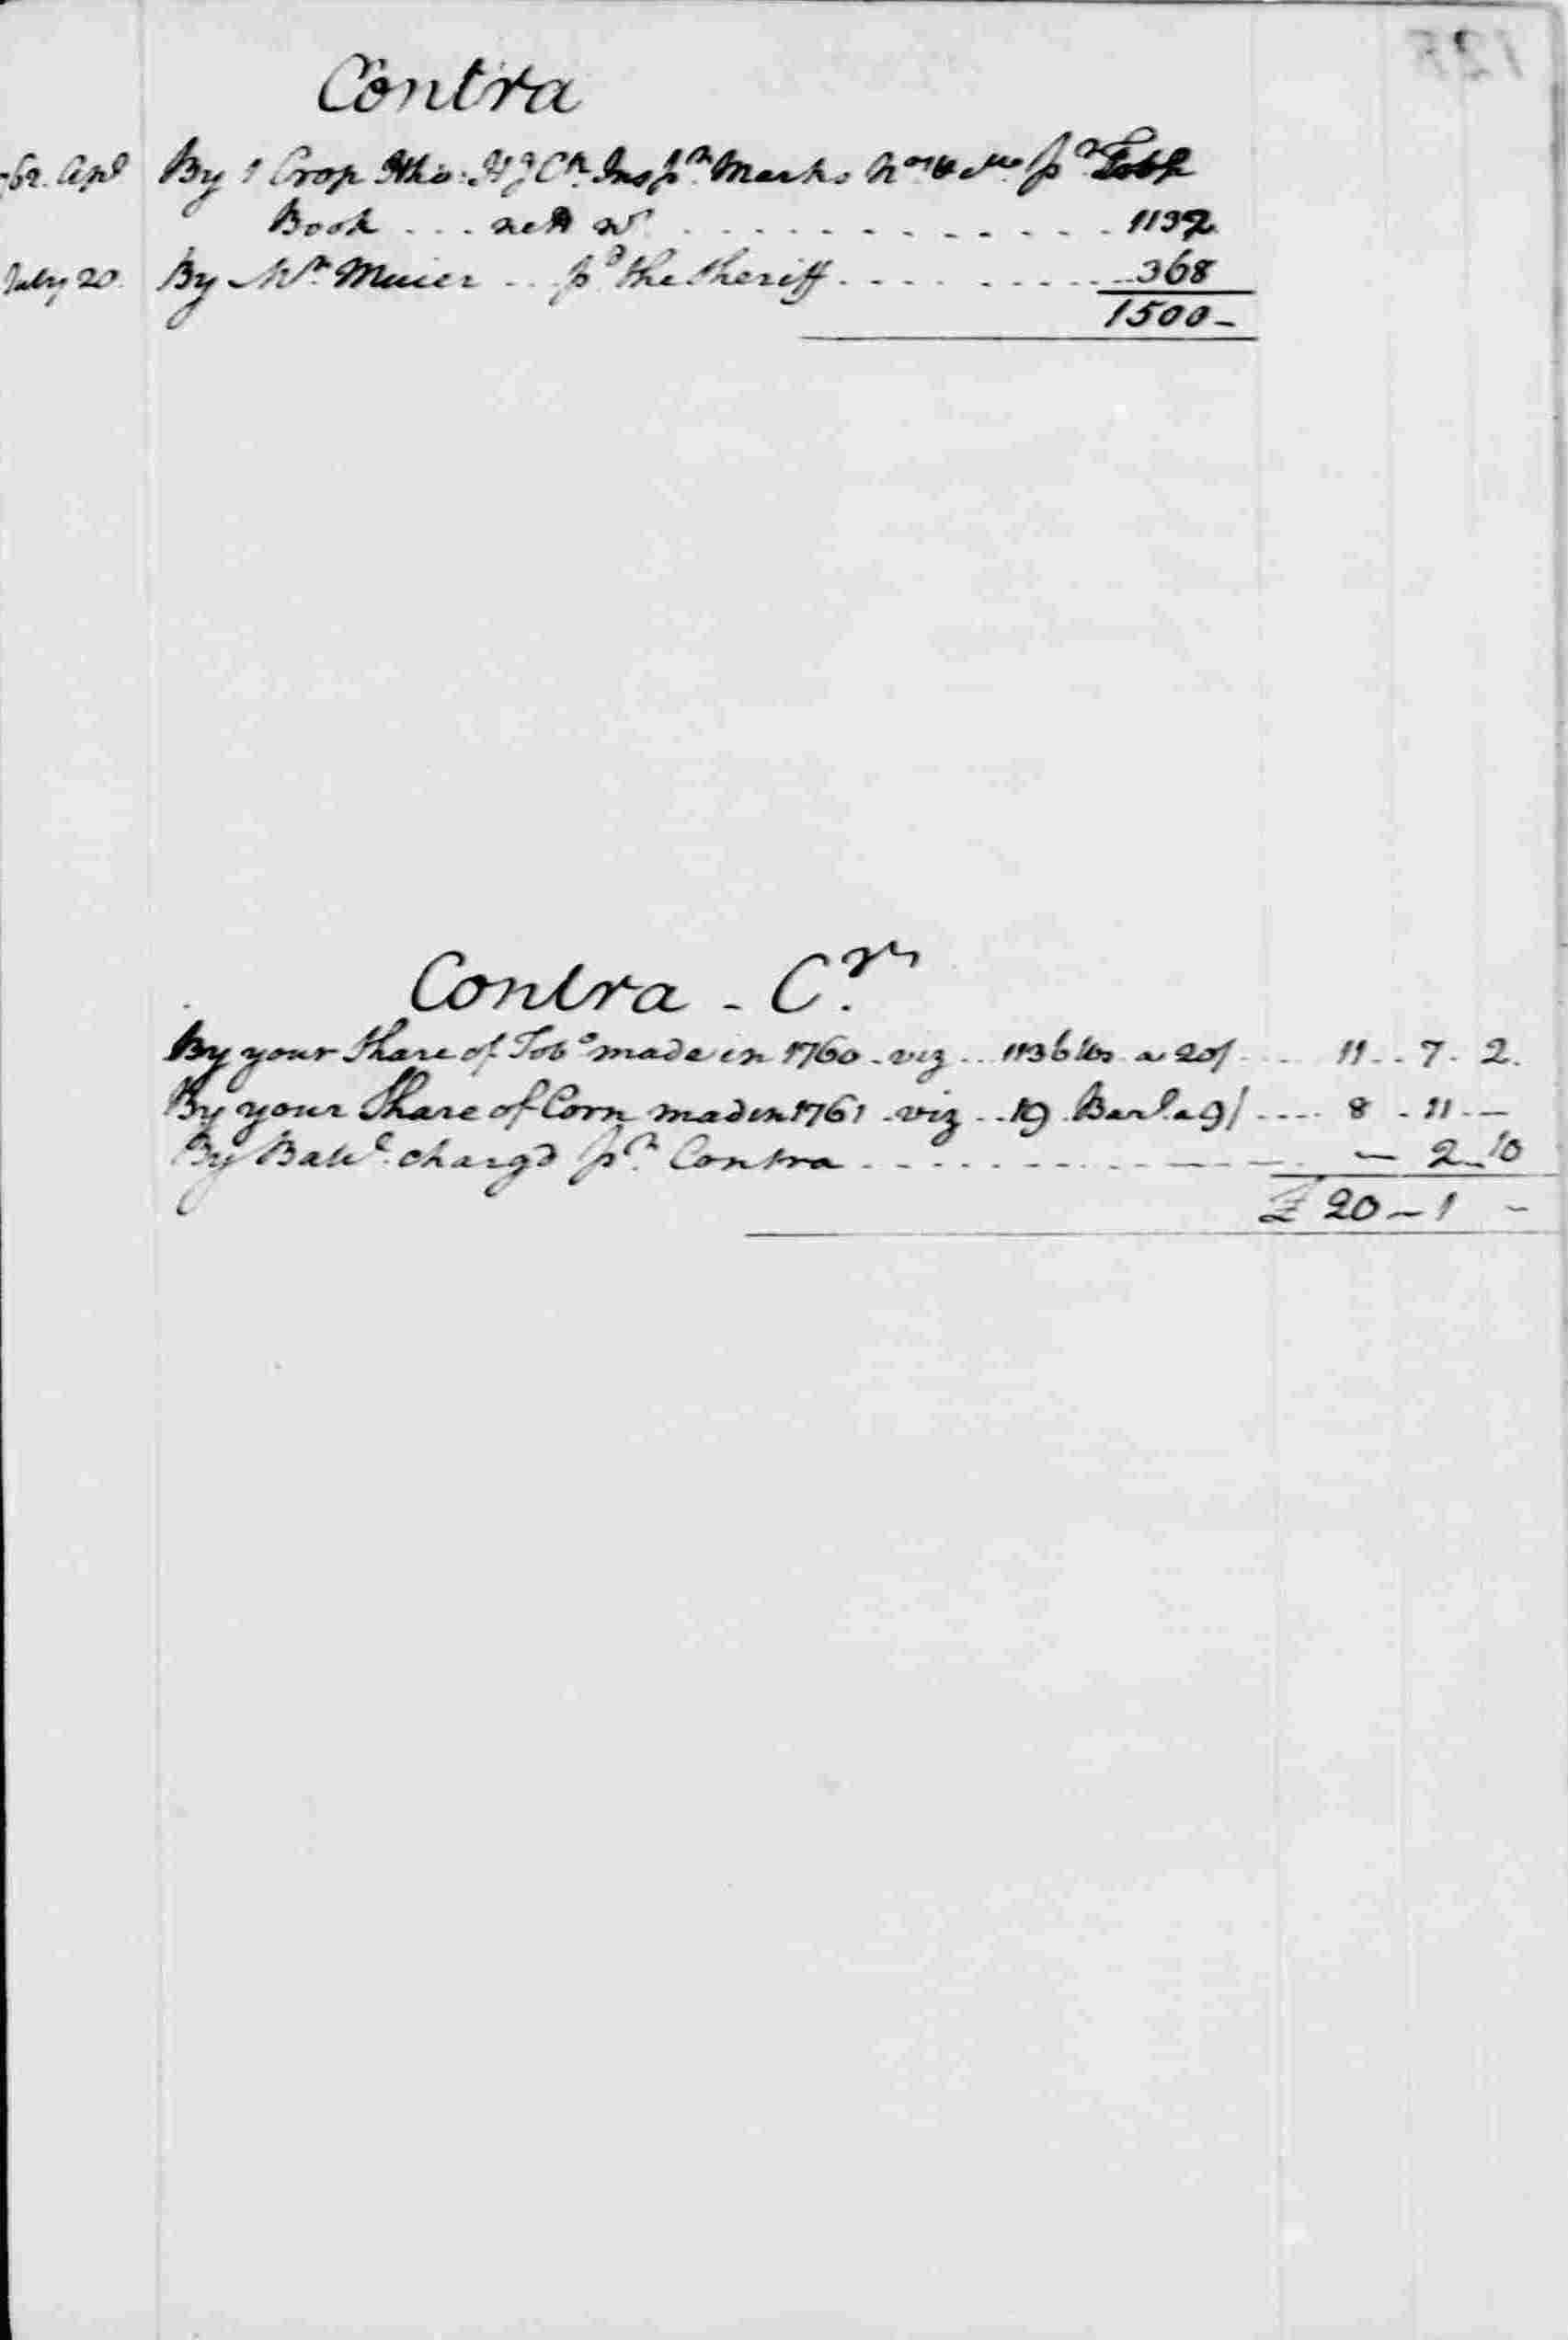 Ledger A, folio 127, right side